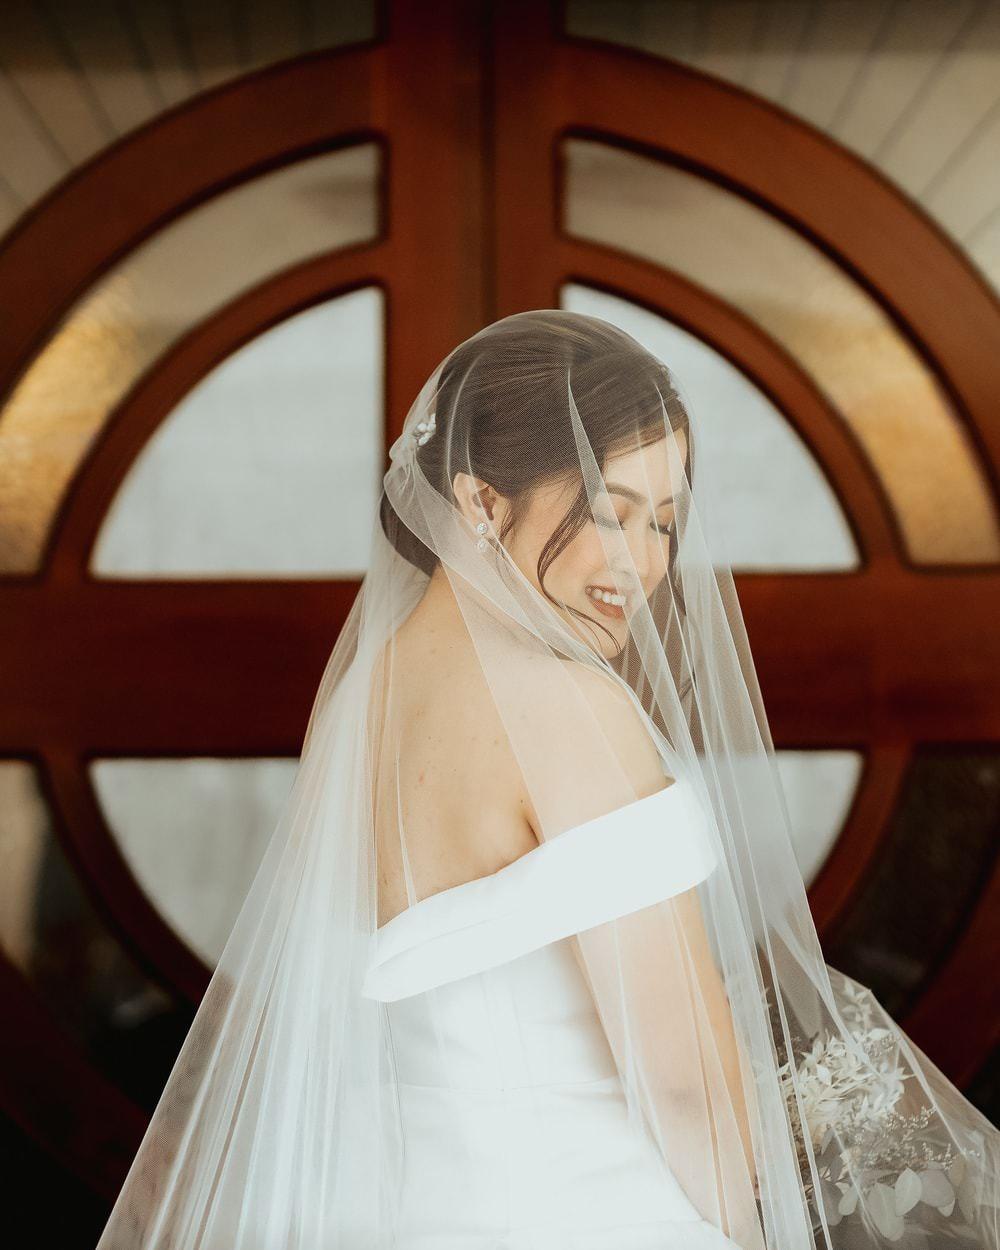 Dress Gown Bride Bridal Strapless Off Shoulder Bardot VeilPhilippines Wedding The Backyard Studios